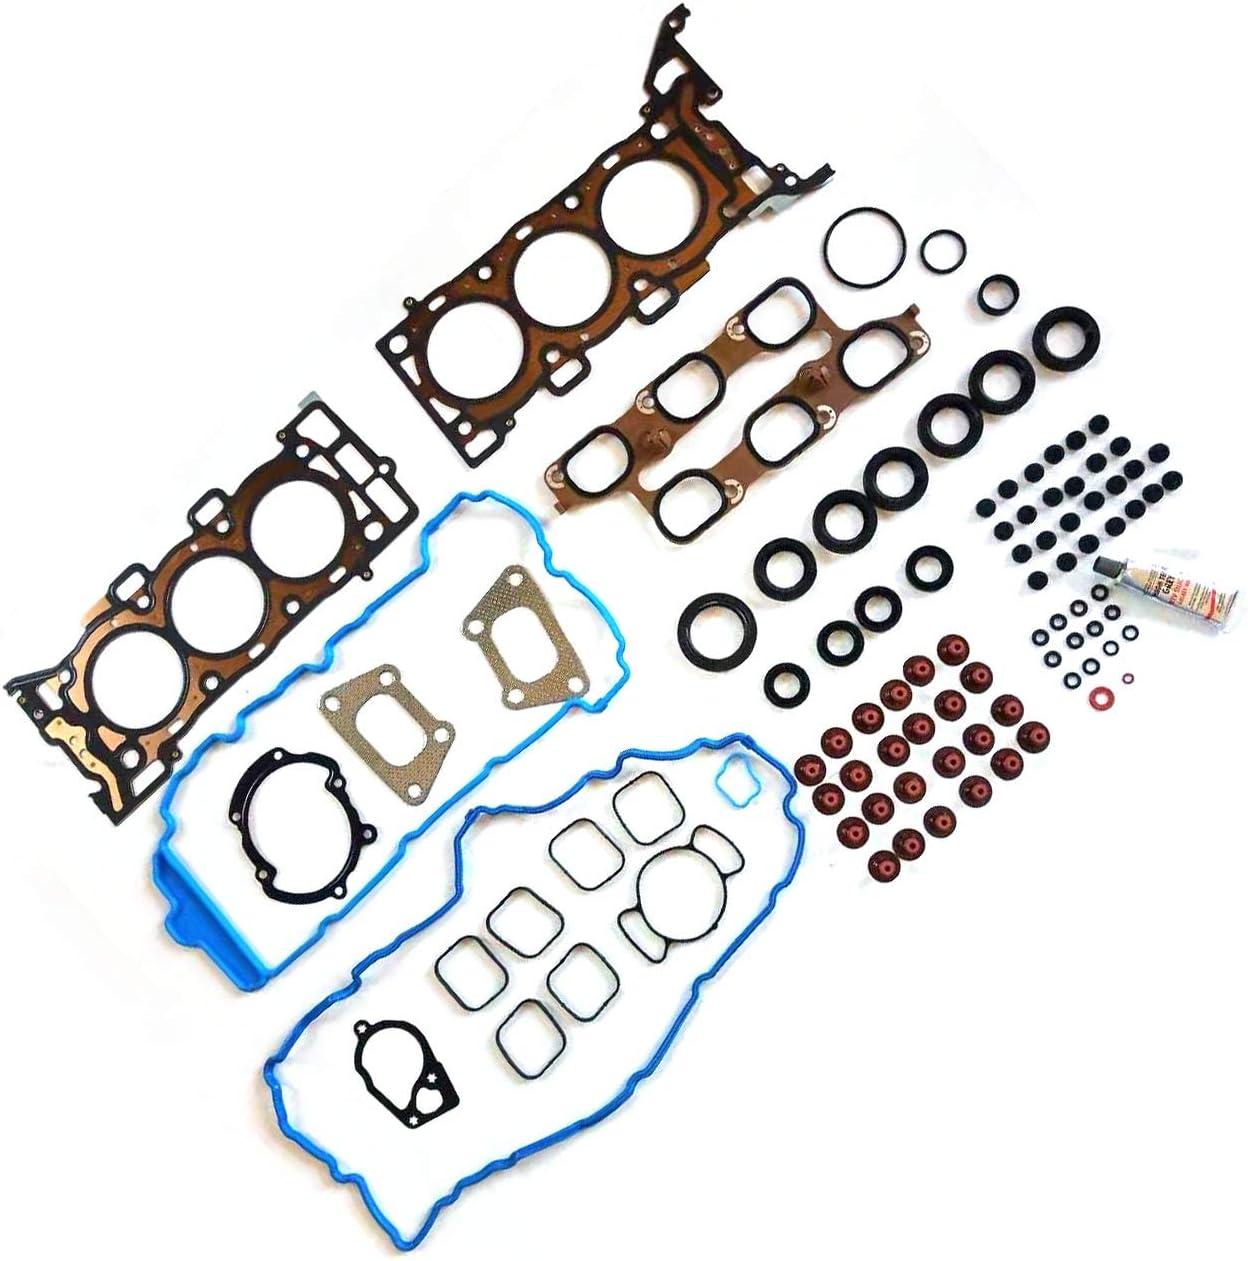 ANPART Automotive Replacement Parts Engine Kits Head Gasket Sets Fit Saab 9-4X 4-Door